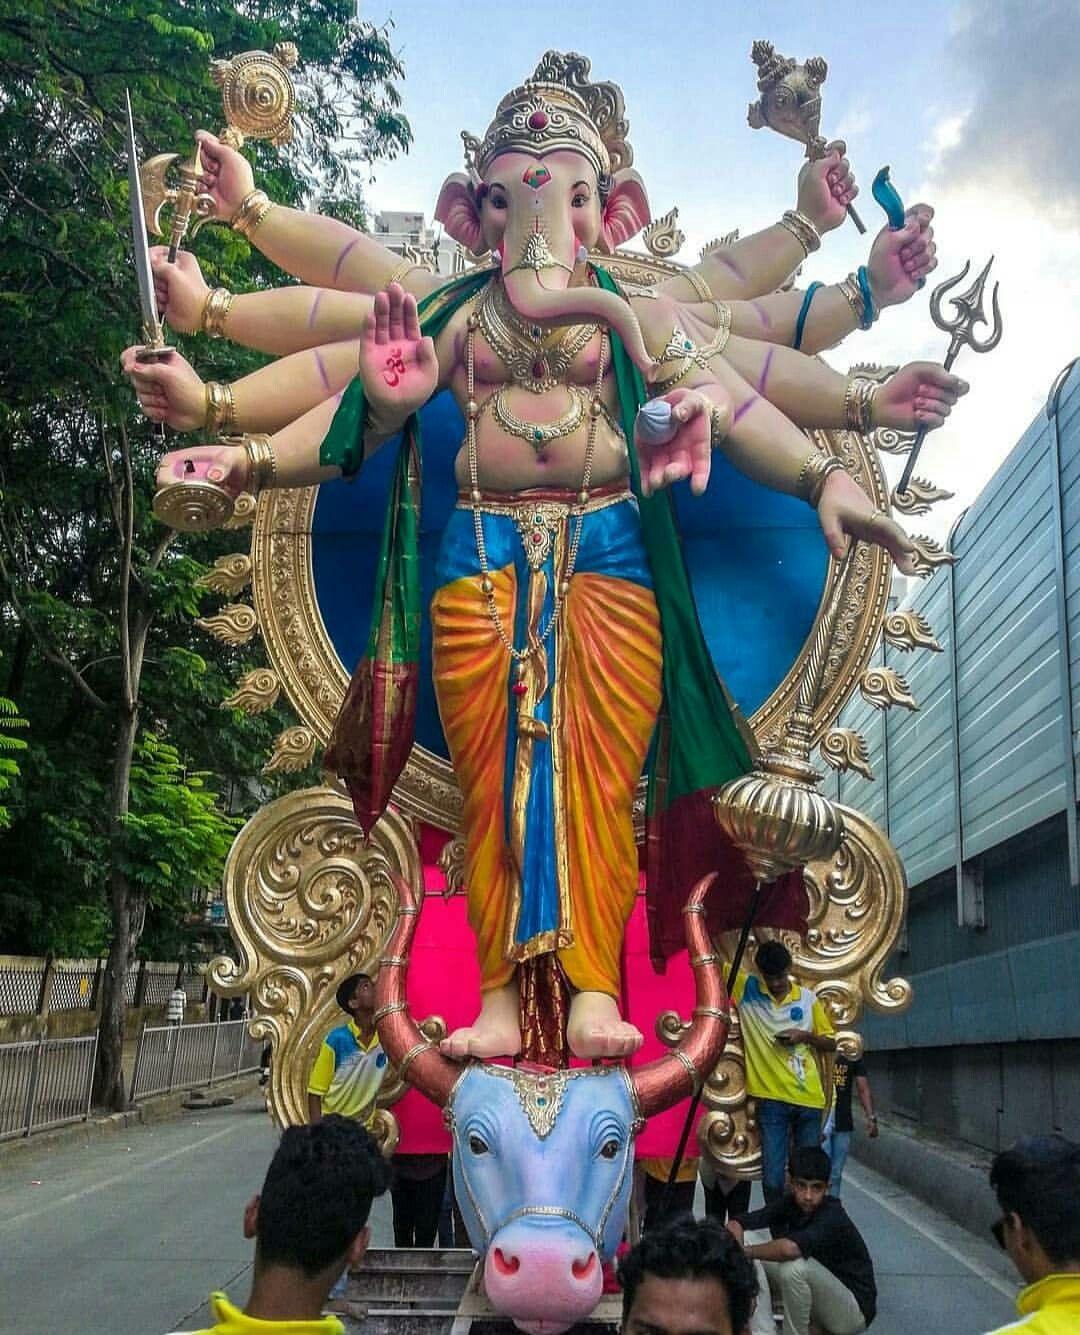 Pin By Ushapai On Ganesh New Types Shri Ganesh Images Ganesh Images Ganesha Pictures